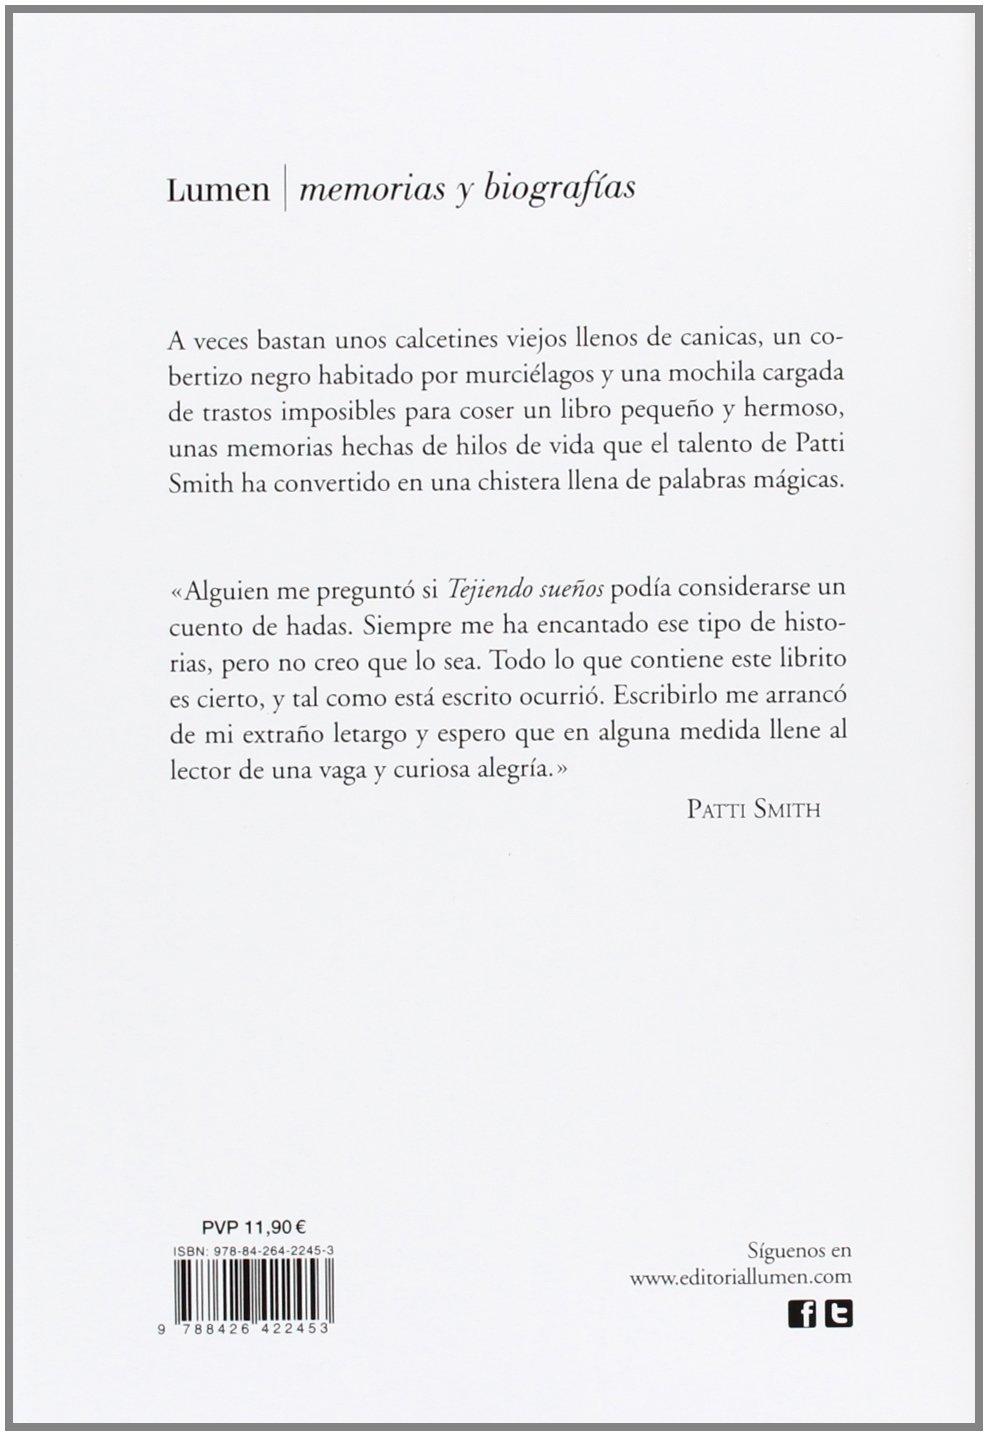 Tejiendo sueños / Woolgathering (Spanish Edition): Patti Smith: 9788426422453: Amazon.com: Books